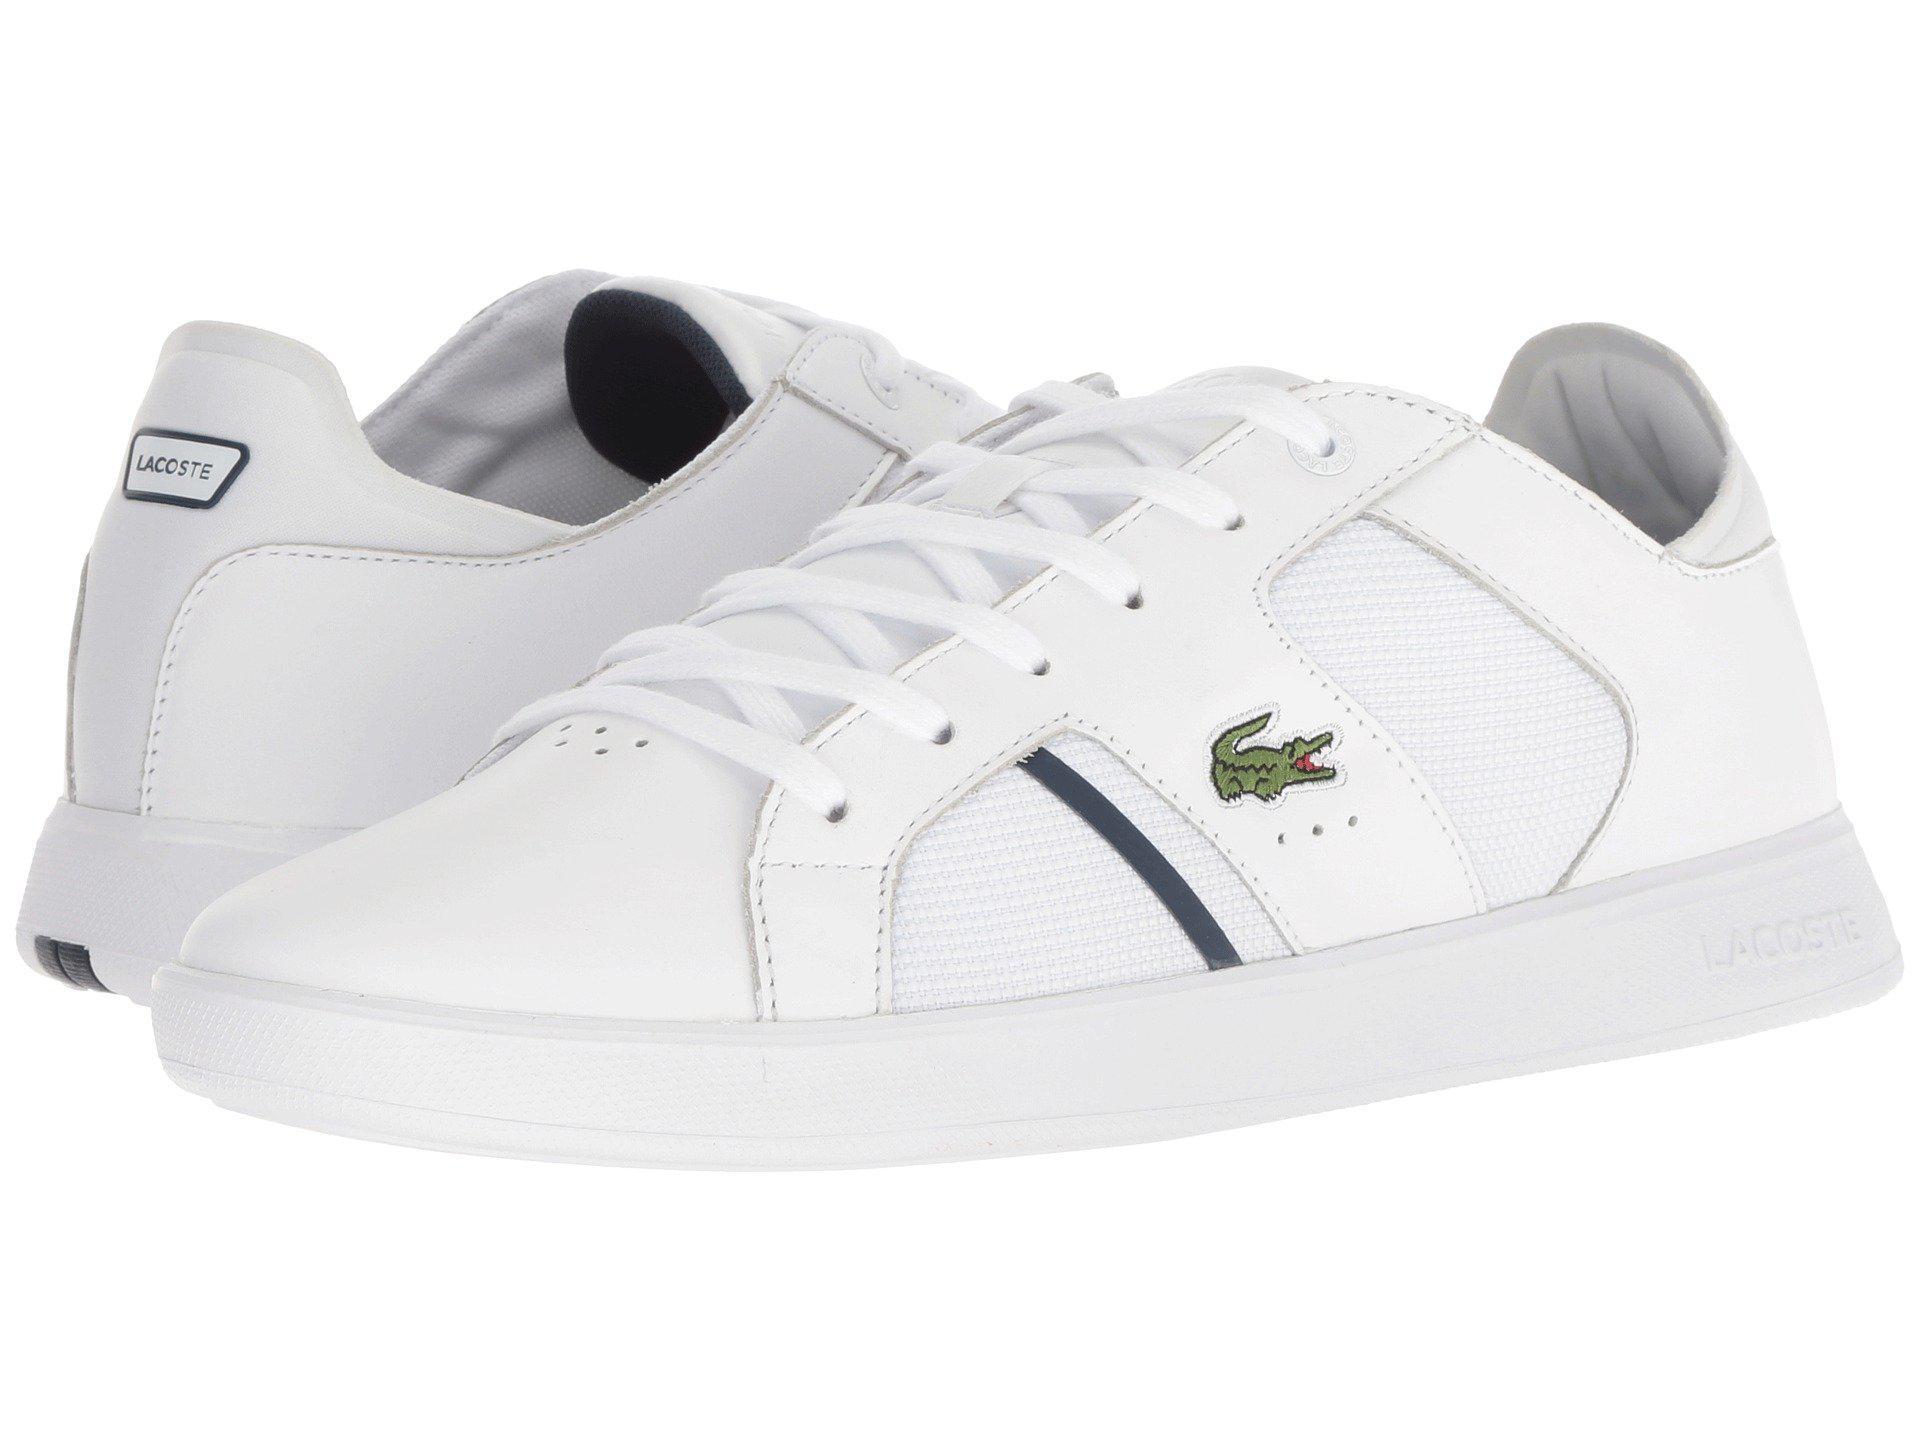 6af847e31 Lacoste - White Novas 318 2 (black grey) Men s Shoes for Men -. View  fullscreen